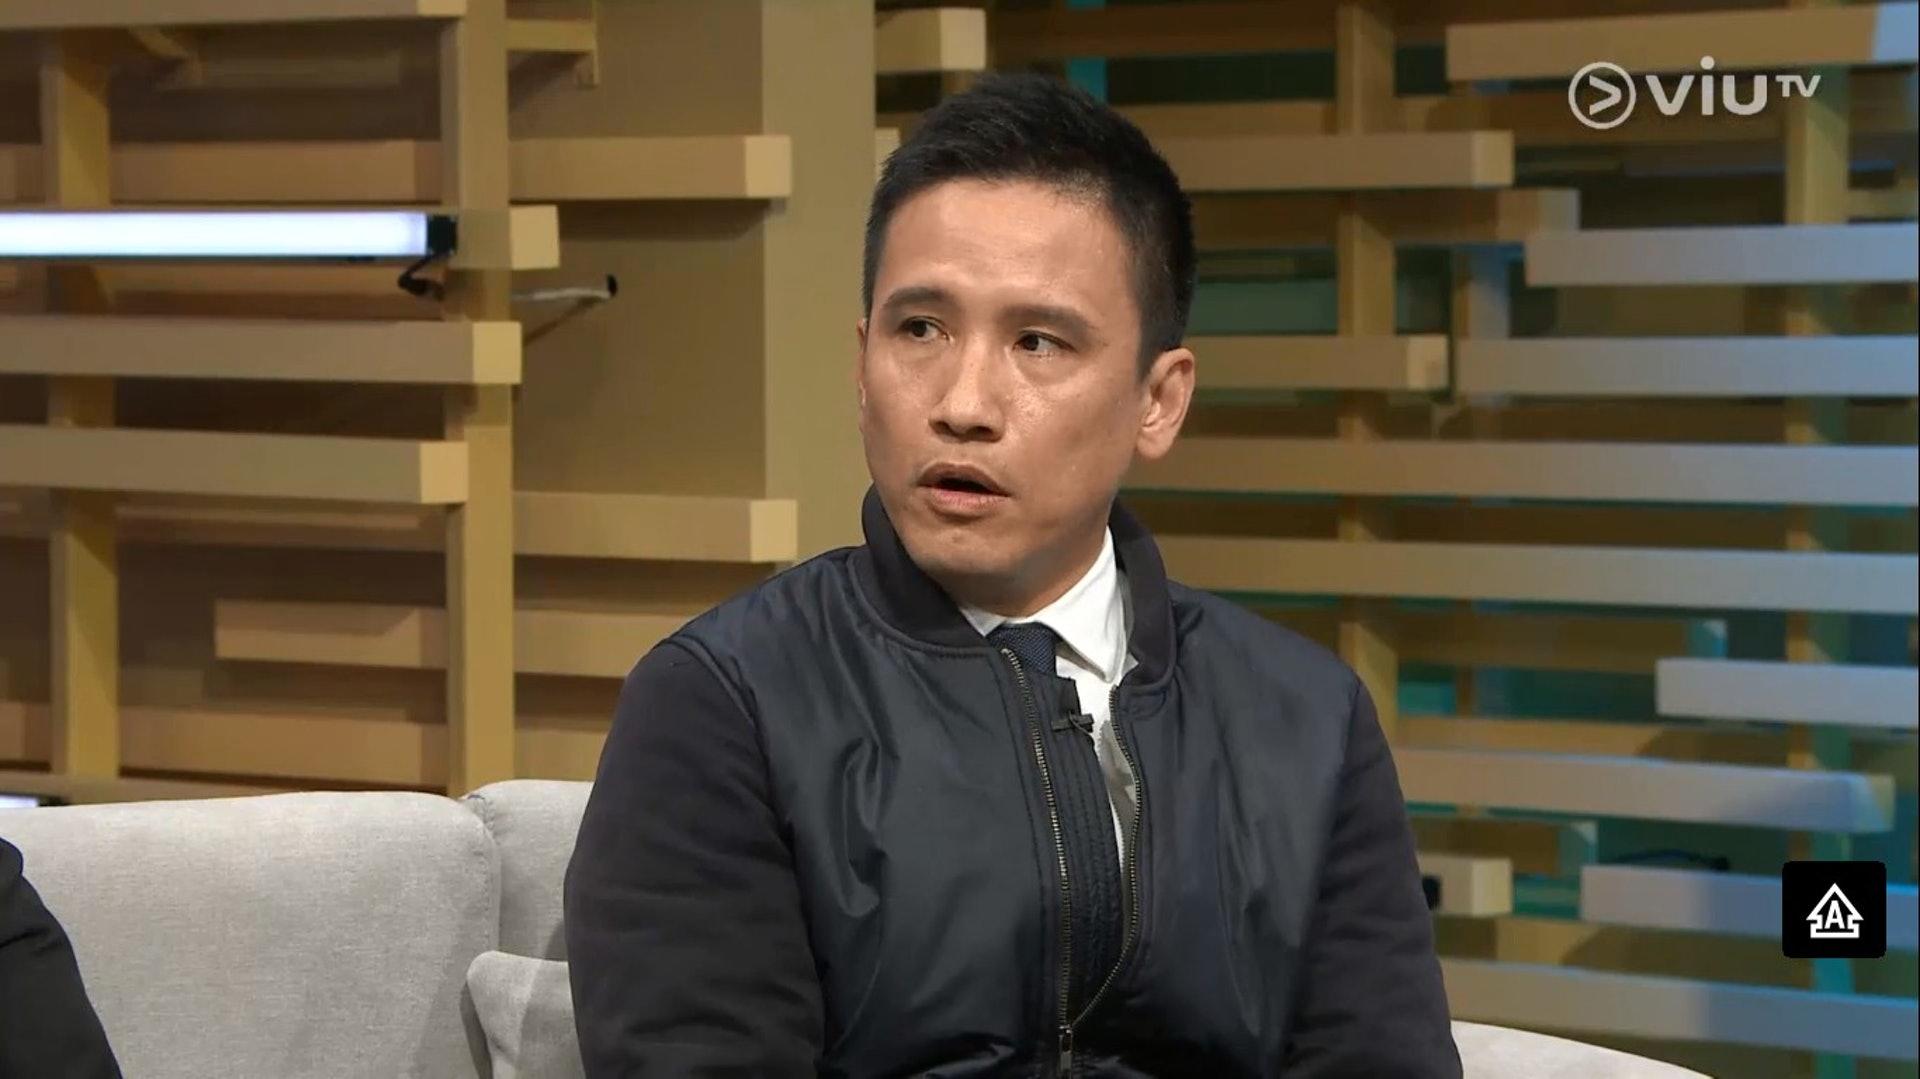 ViuTV新節目《今日疫情》提供大量武漢肺炎嘅資訊,就連因搶唔到口罩而產生嘅情緒壓力,都有專業醫生教大家點抗壓。